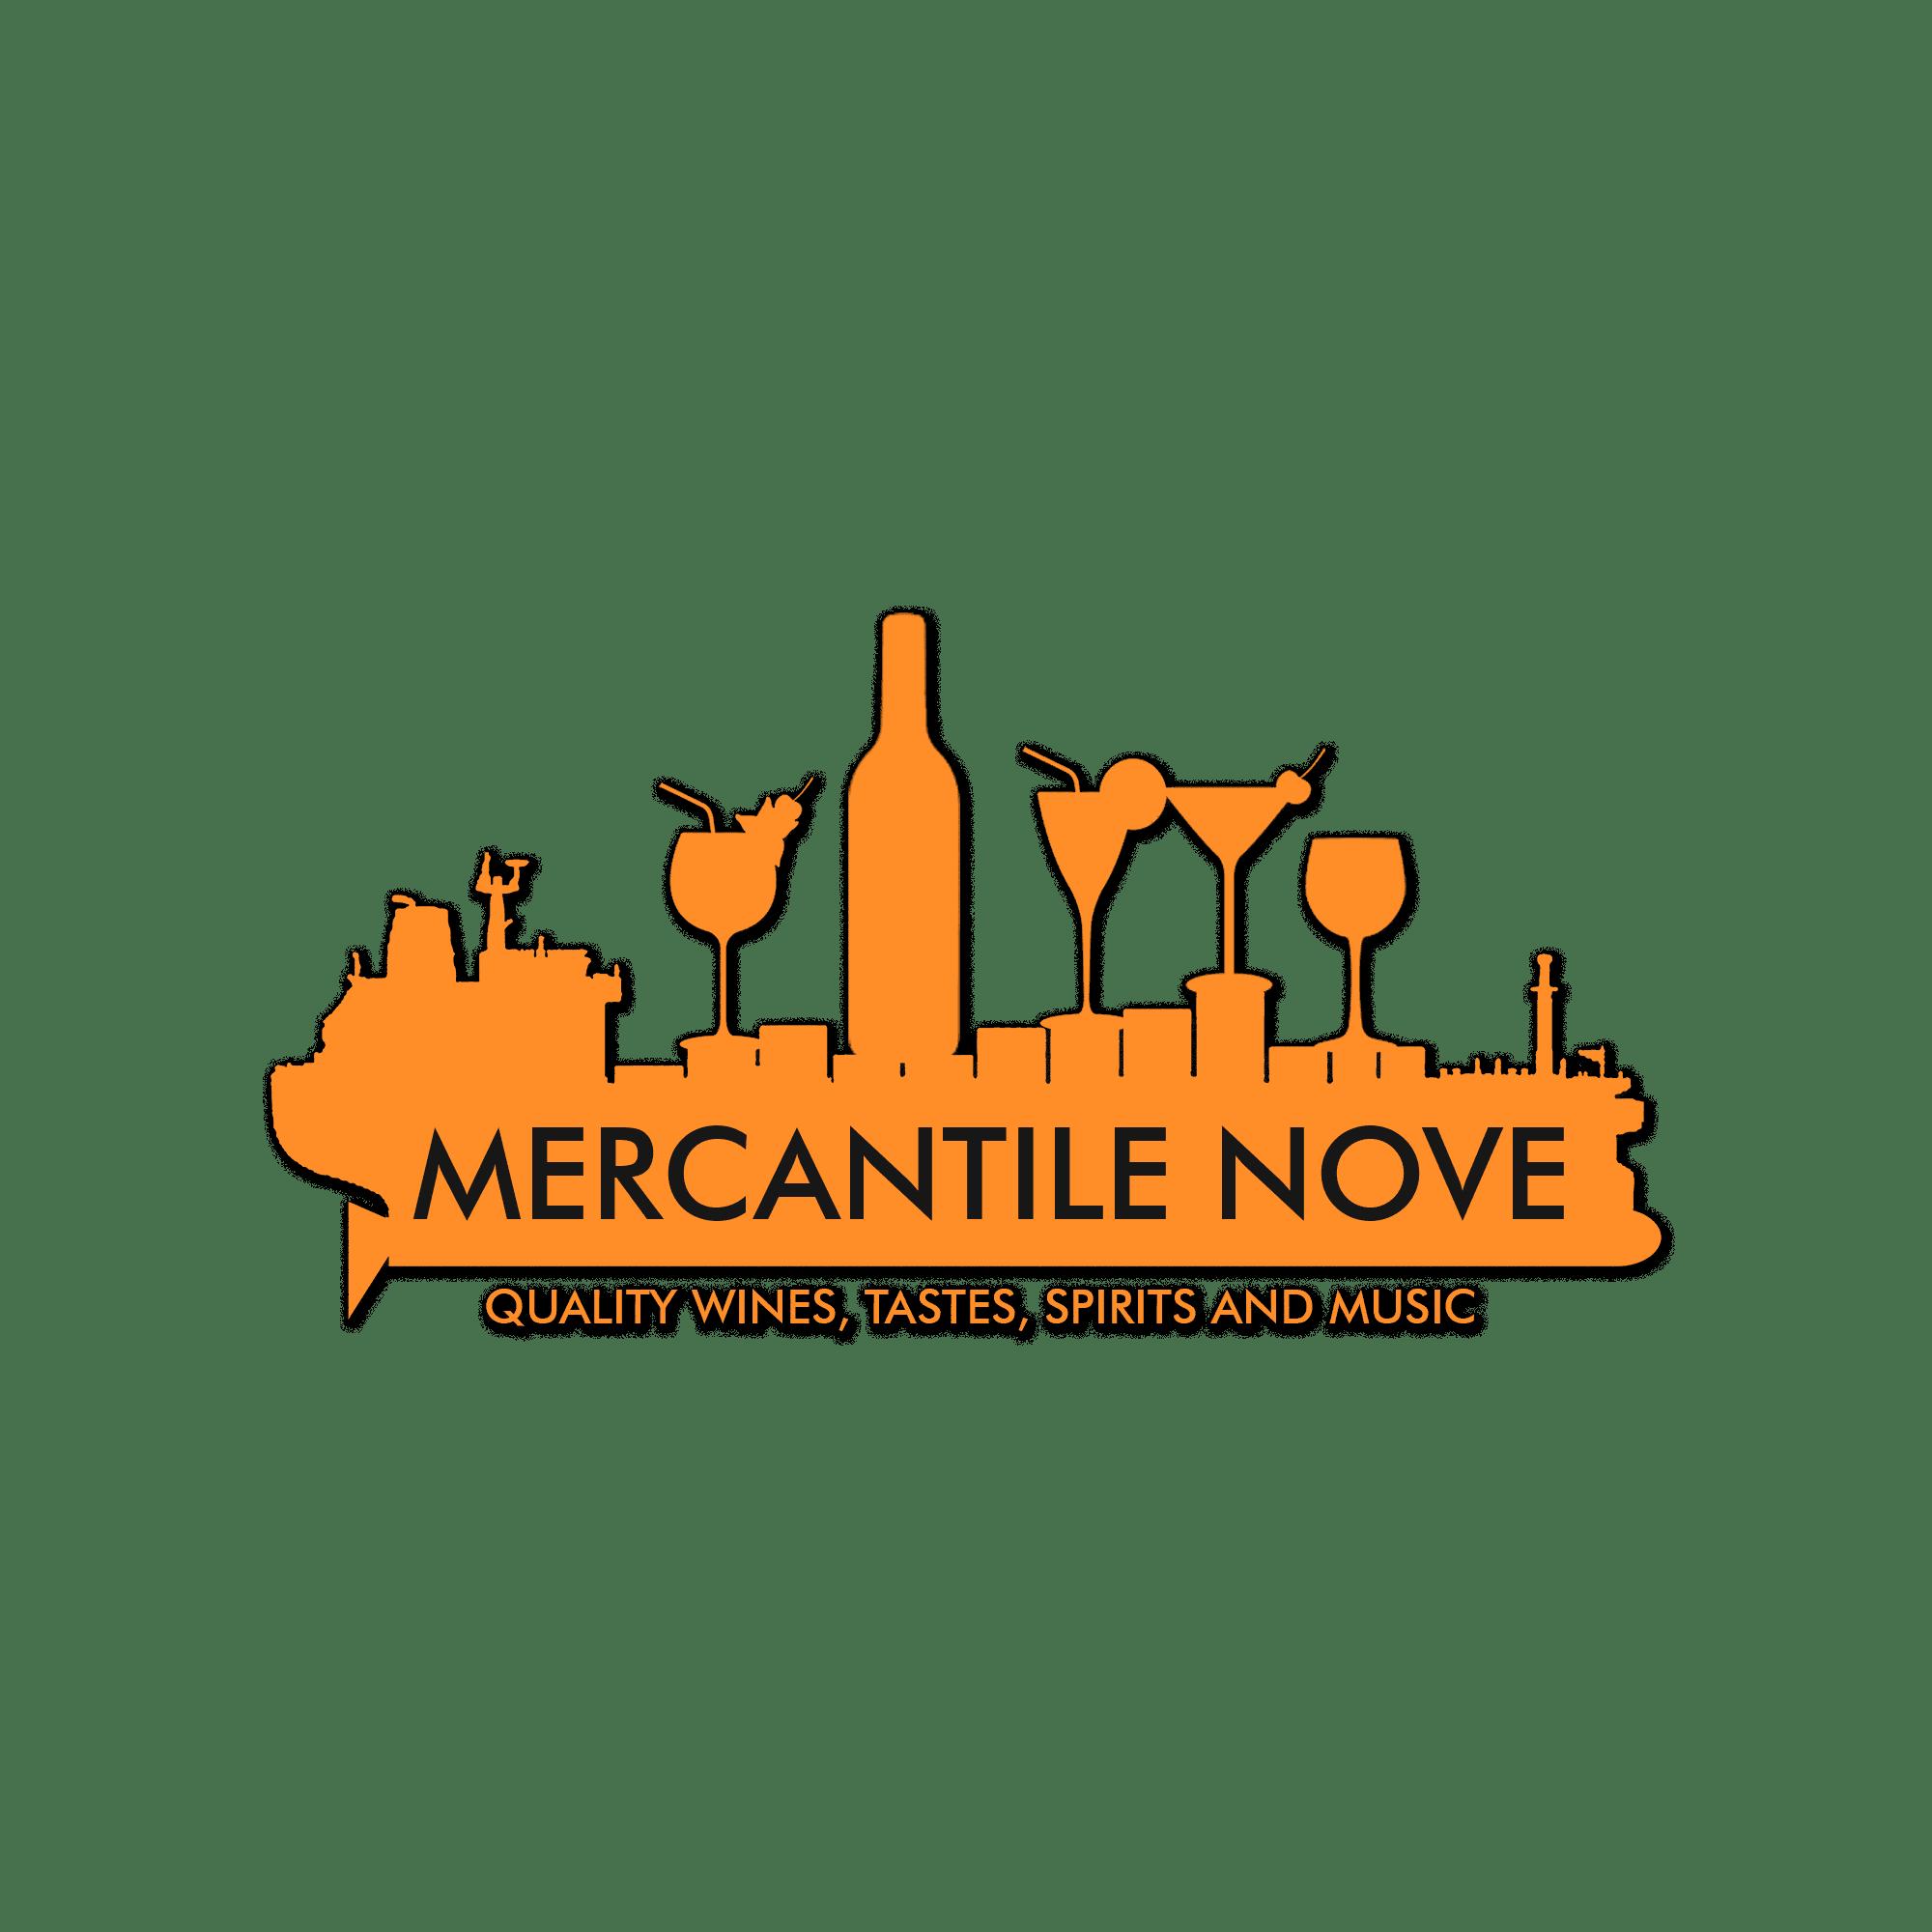 Mercantile Nove